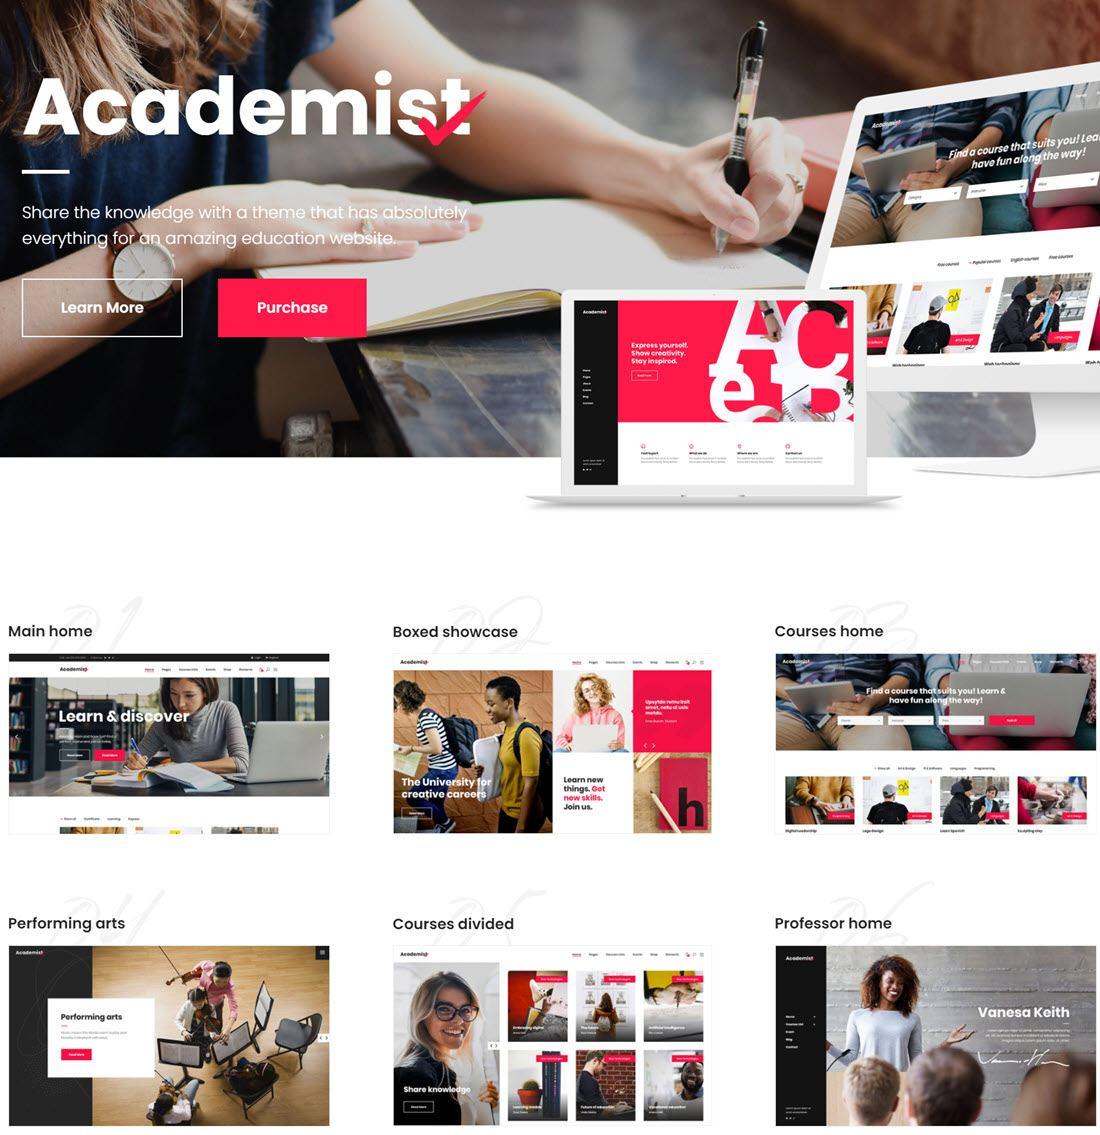 Academist Education & Learning Management System Theme